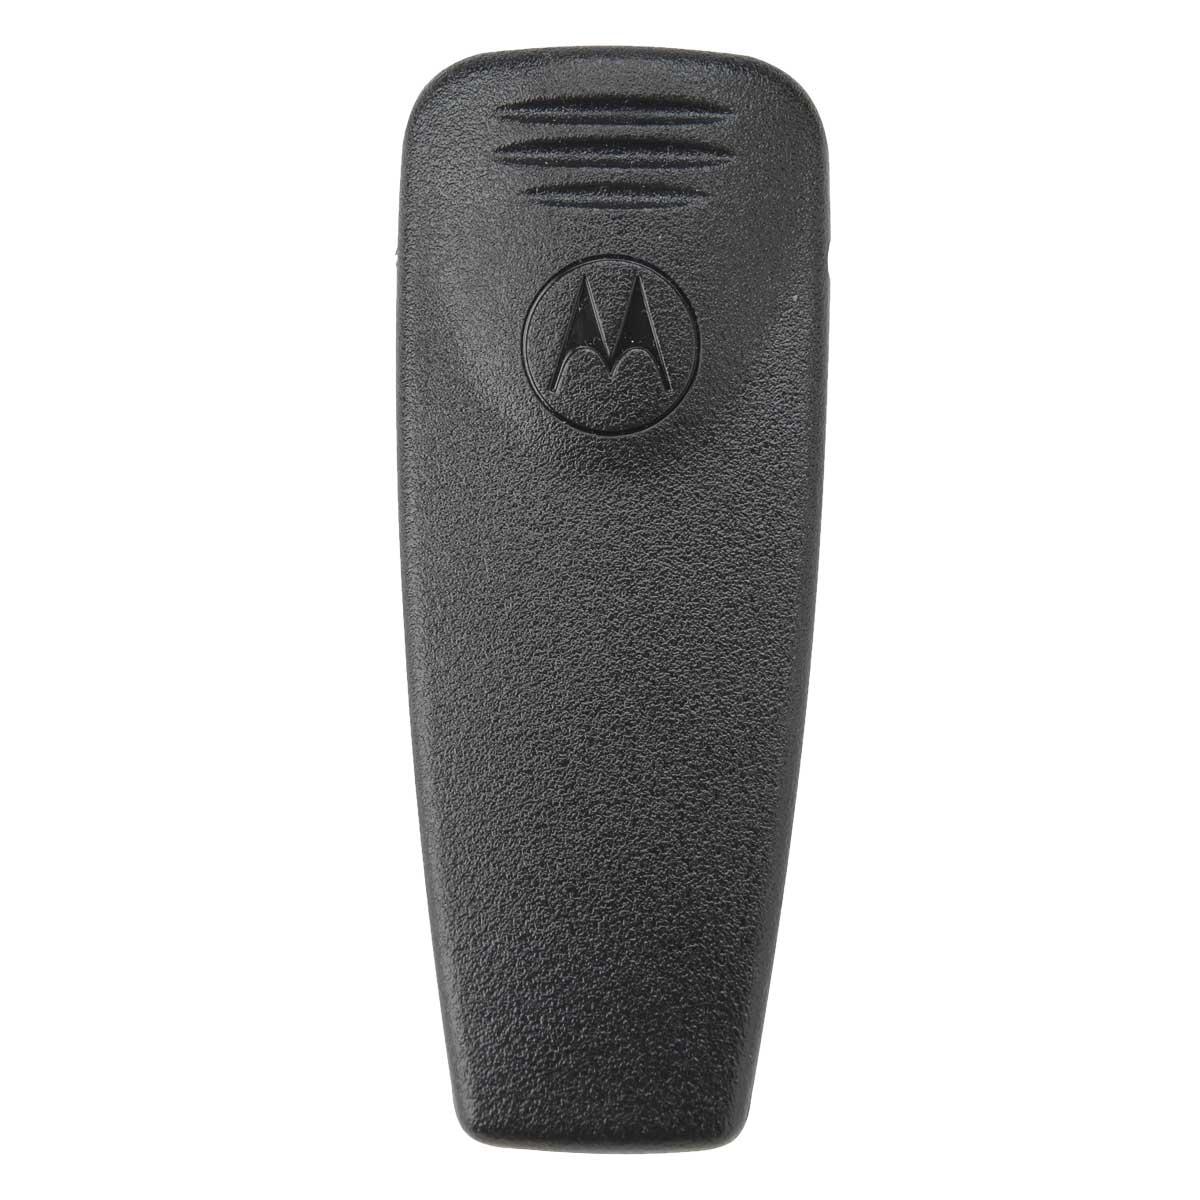 Clip para radio Motorola HLN9844